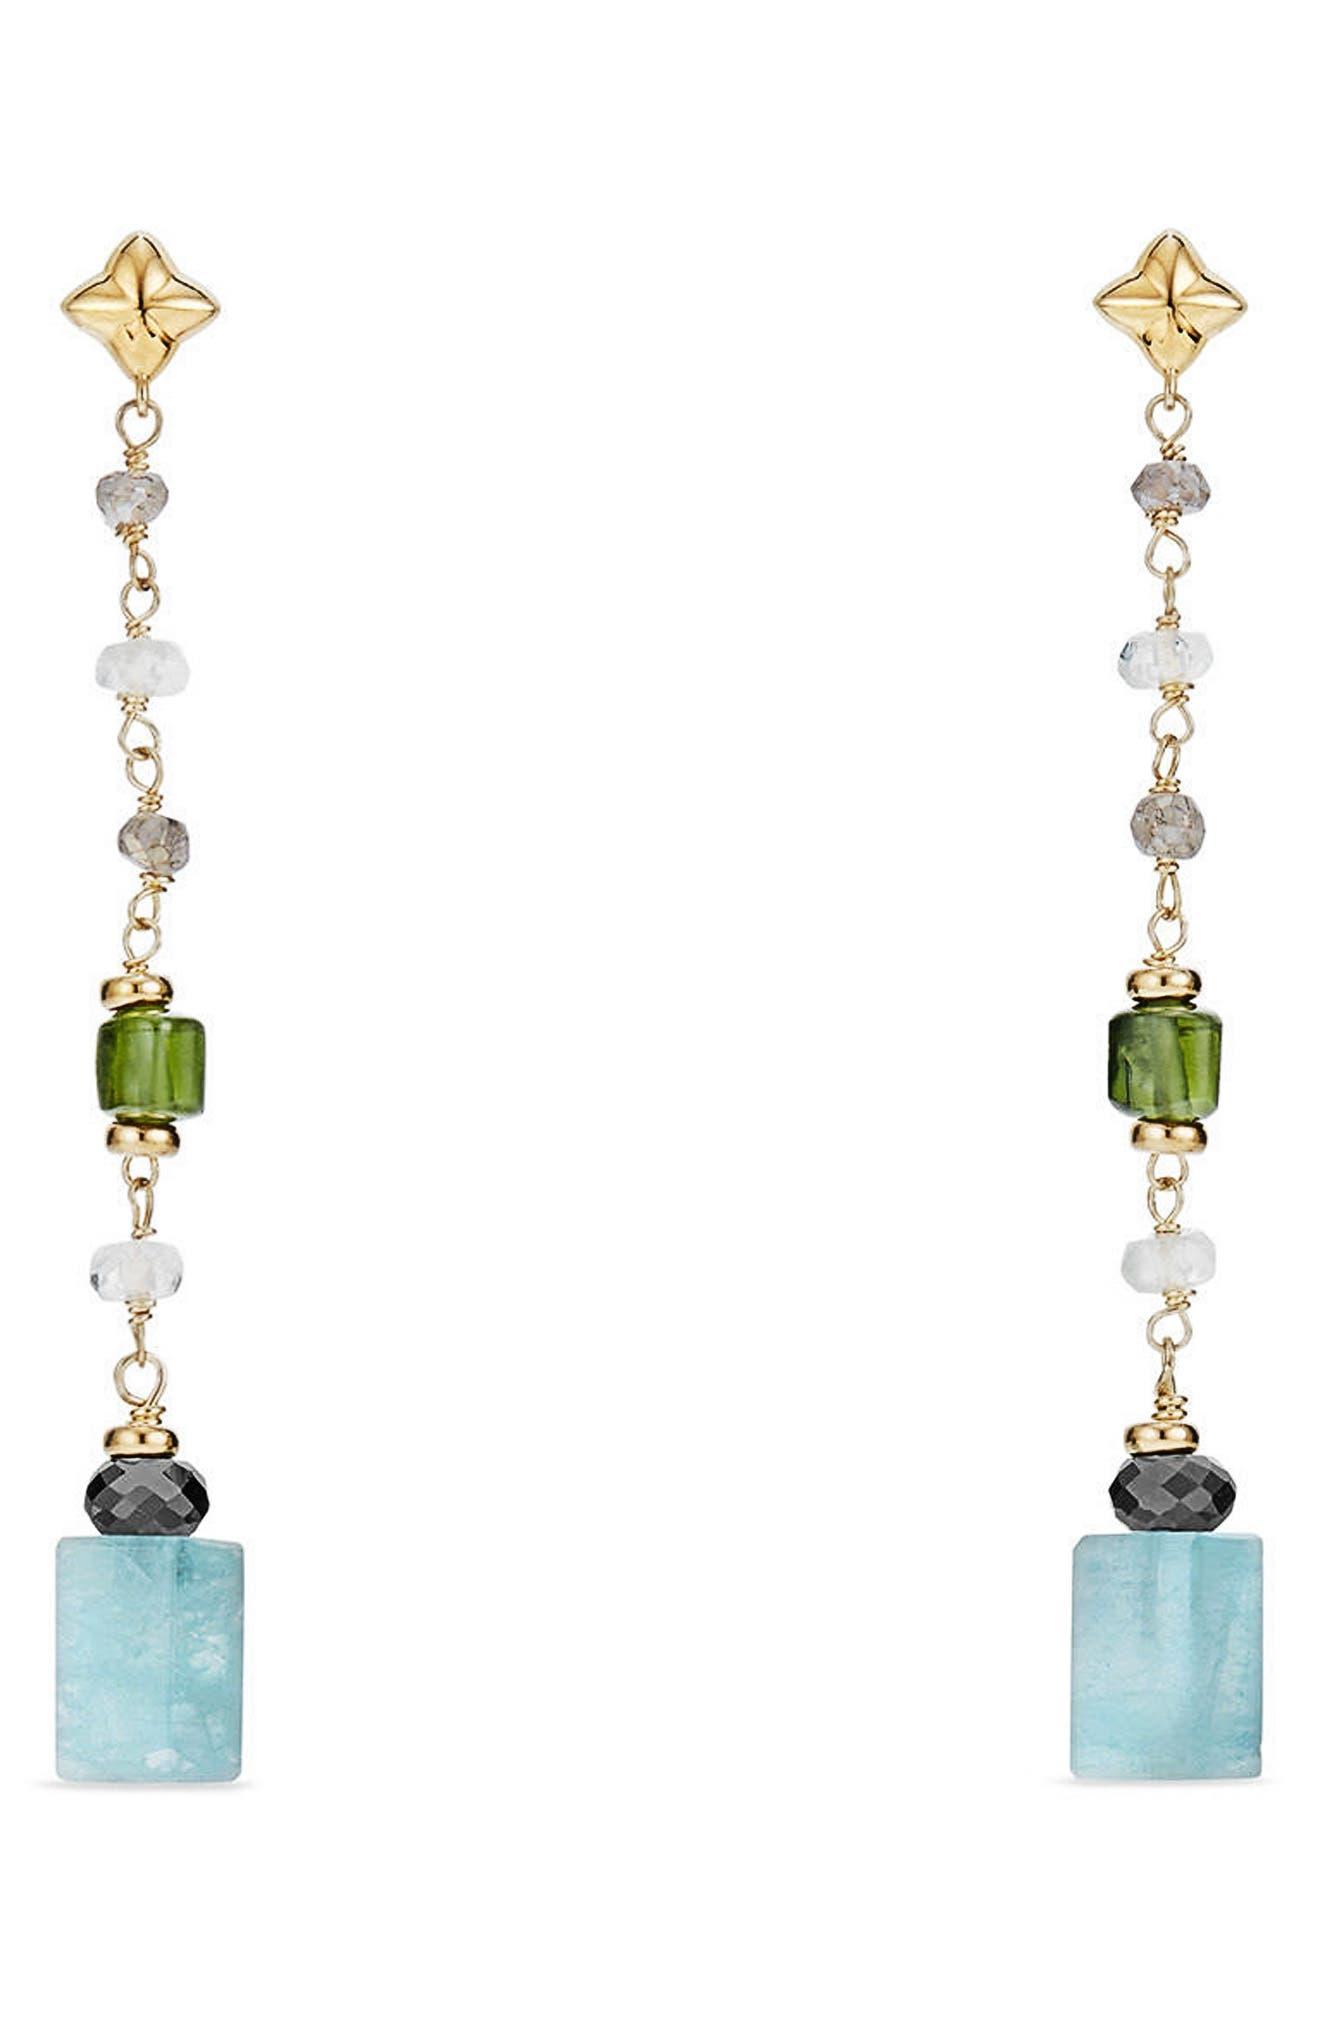 Bead & Chain Earrings with Semiprecious Stones,                         Main,                         color, Aquamarine